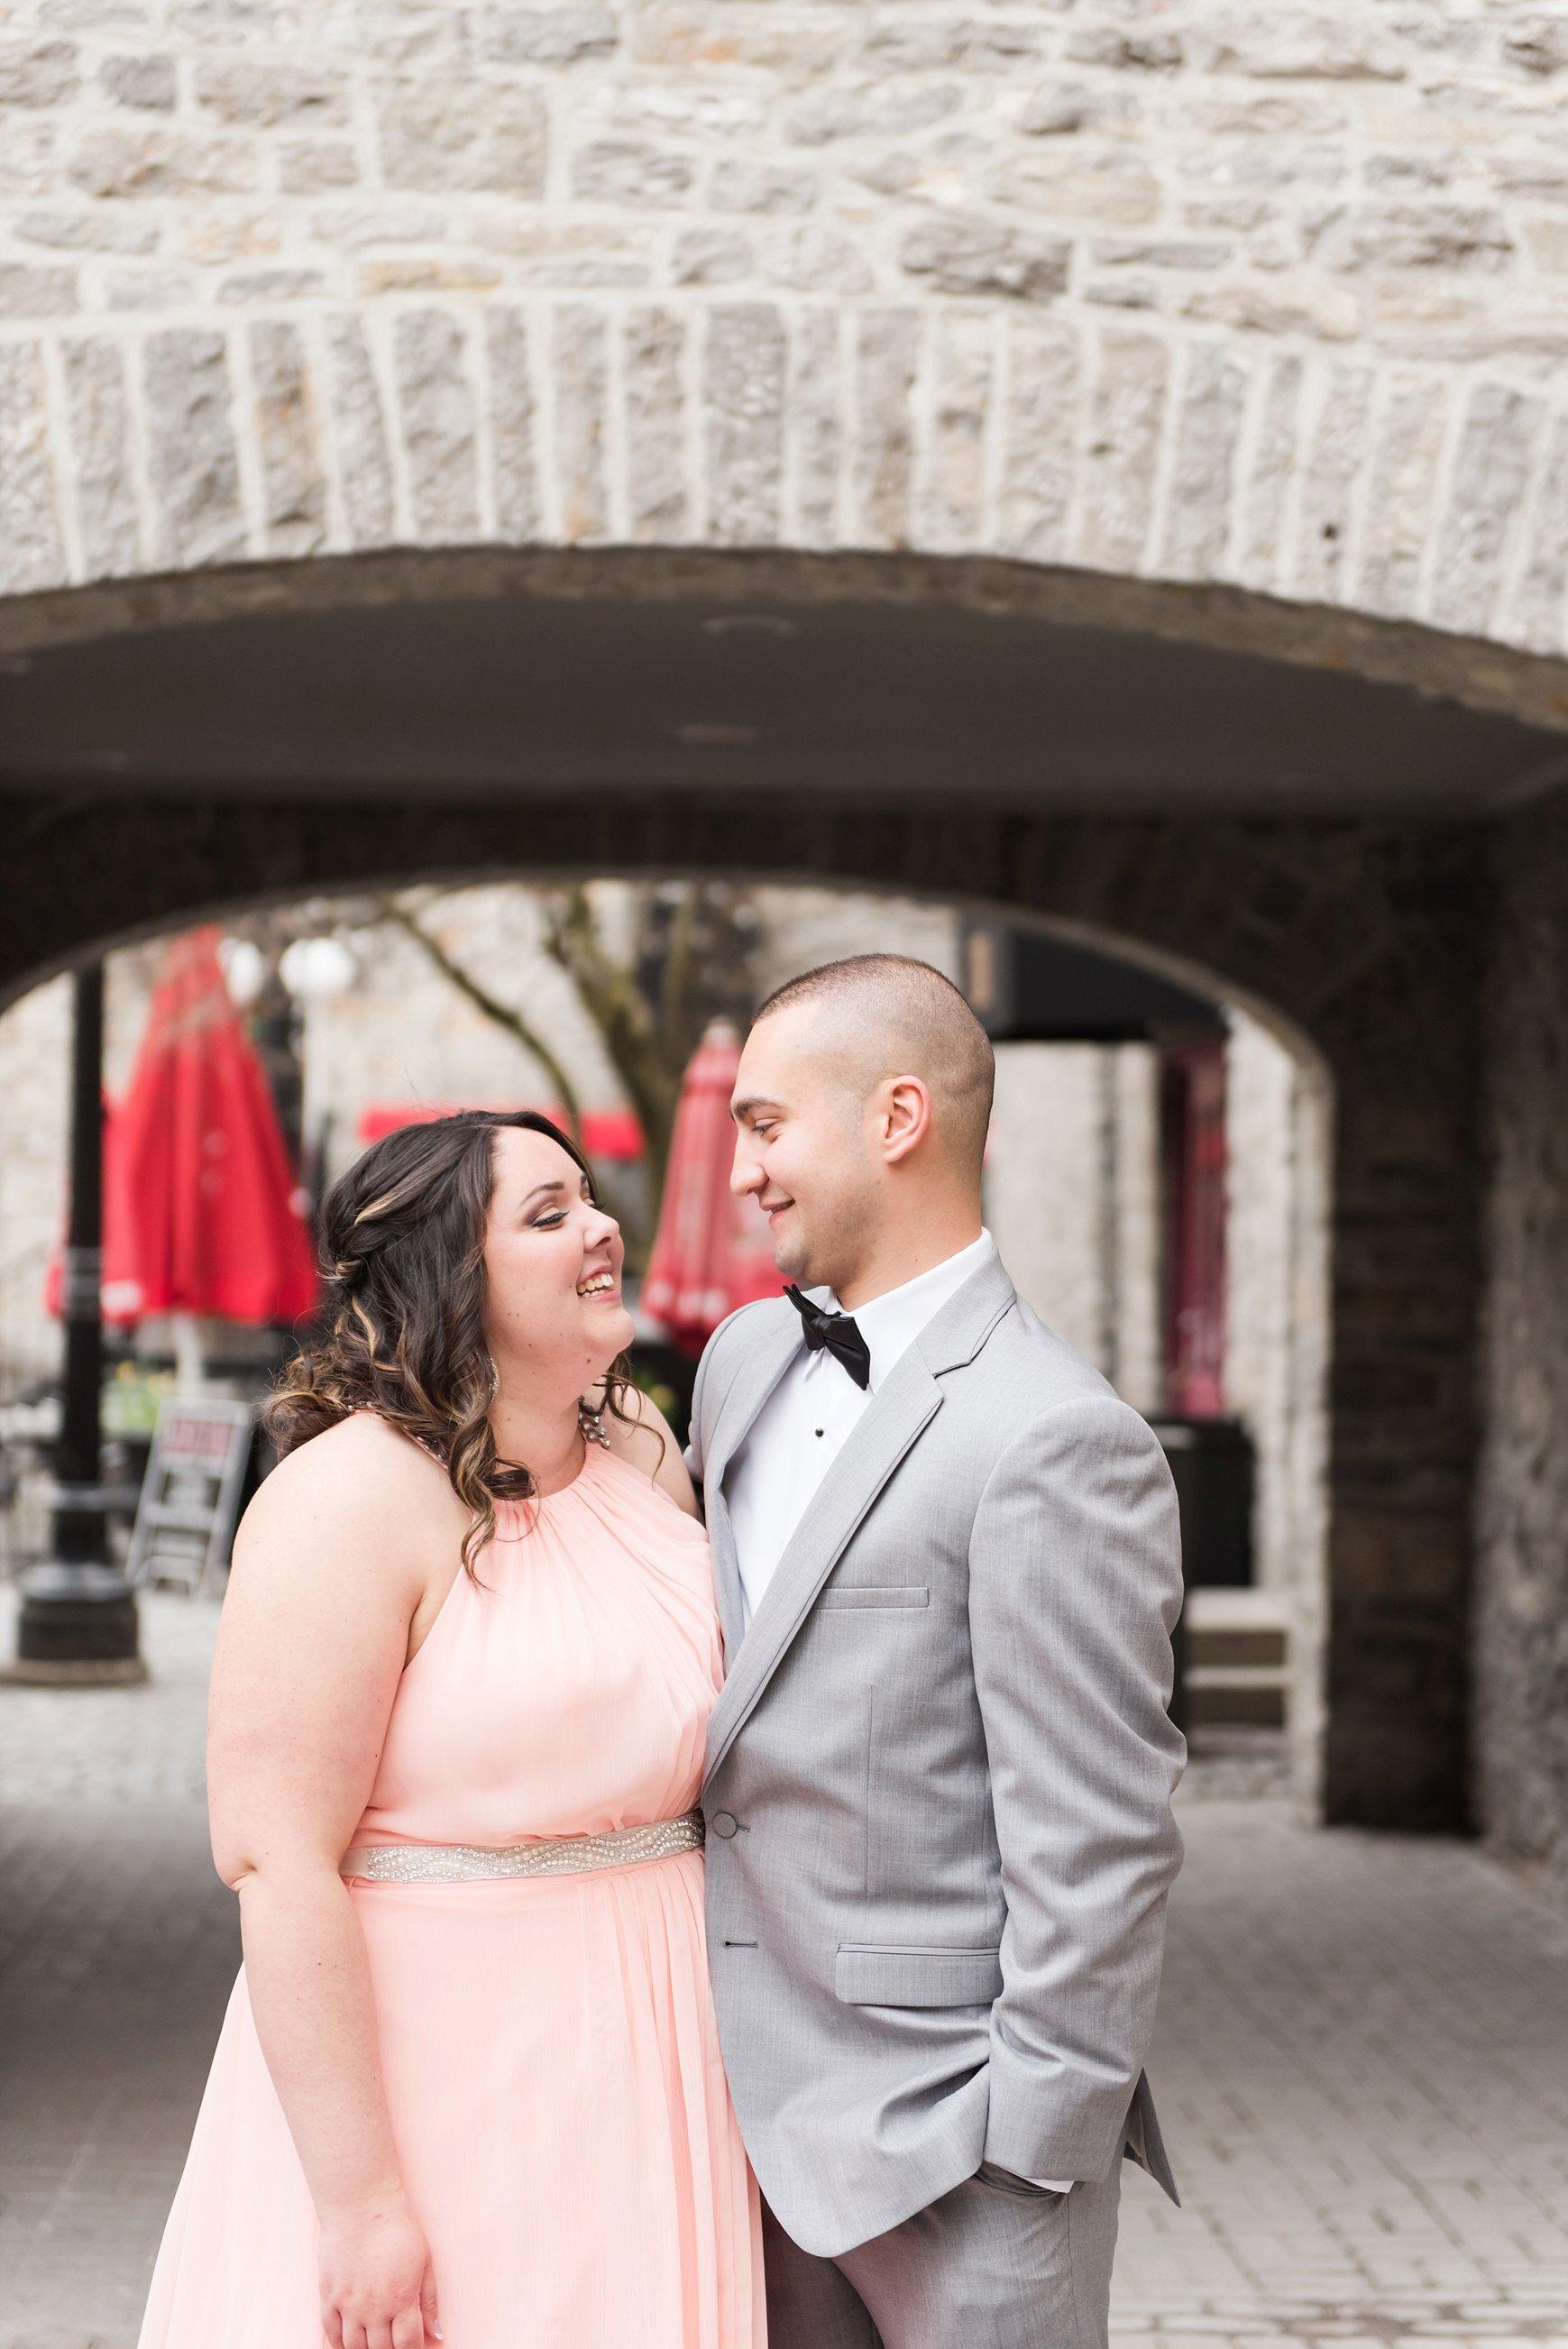 Sarmad Ashley Engagement Shoot- Ali Batoul Creatives Fine Art Wedding Photography_0054.jpg